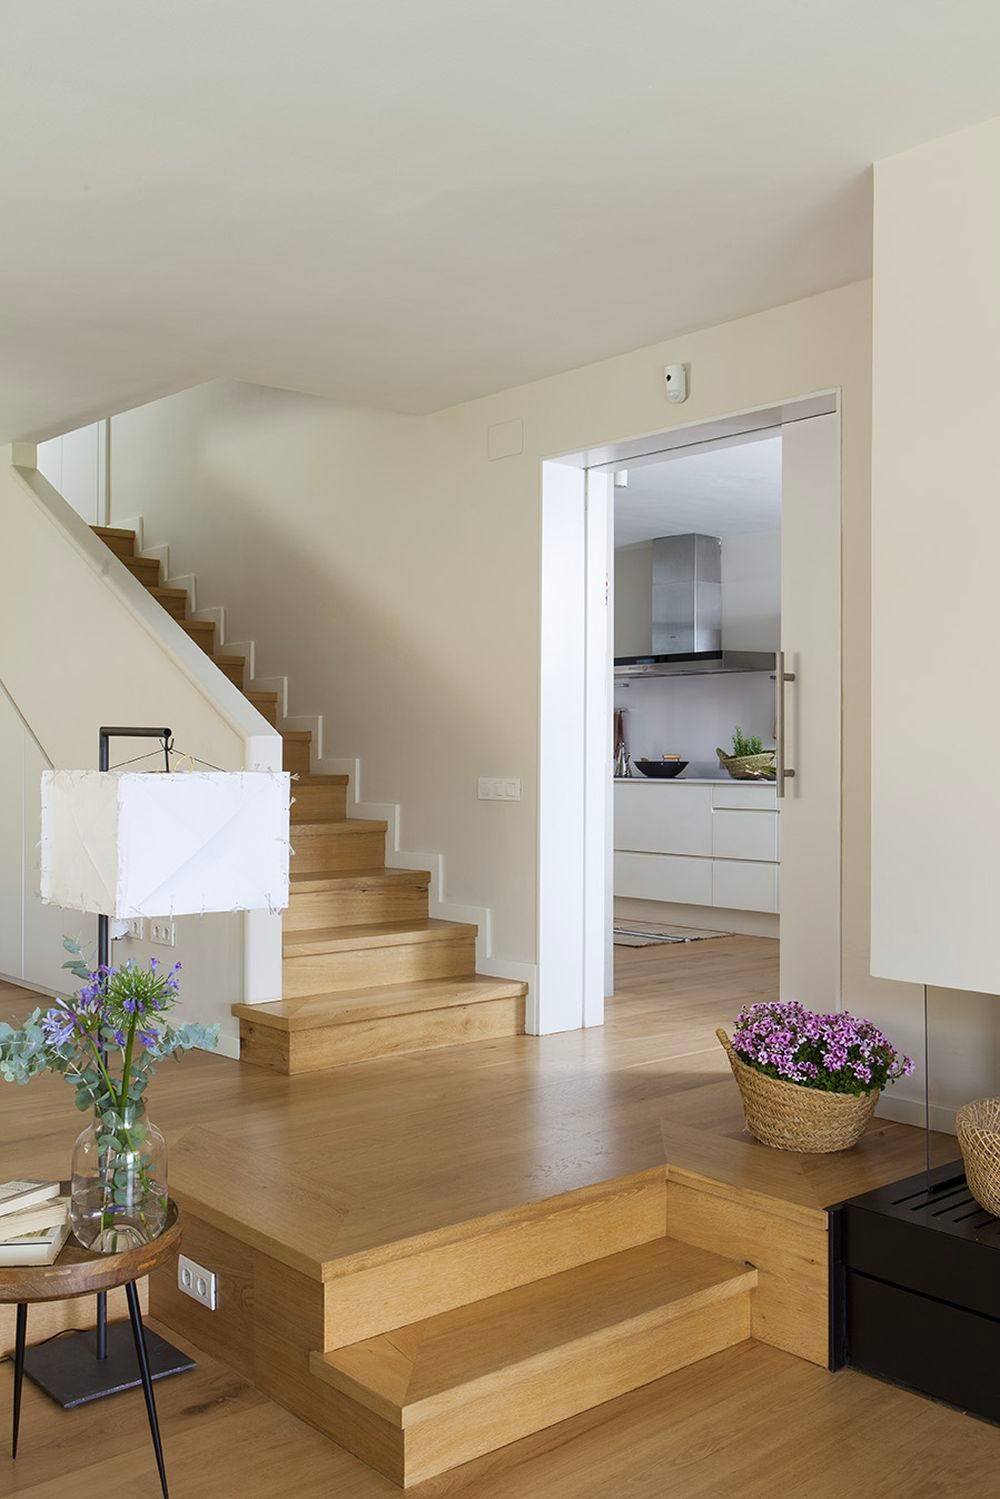 adelaparvu.com despre casa cu gradina, accente marine, designer Jeanette Dresing, Foto Feran Freixa (9)